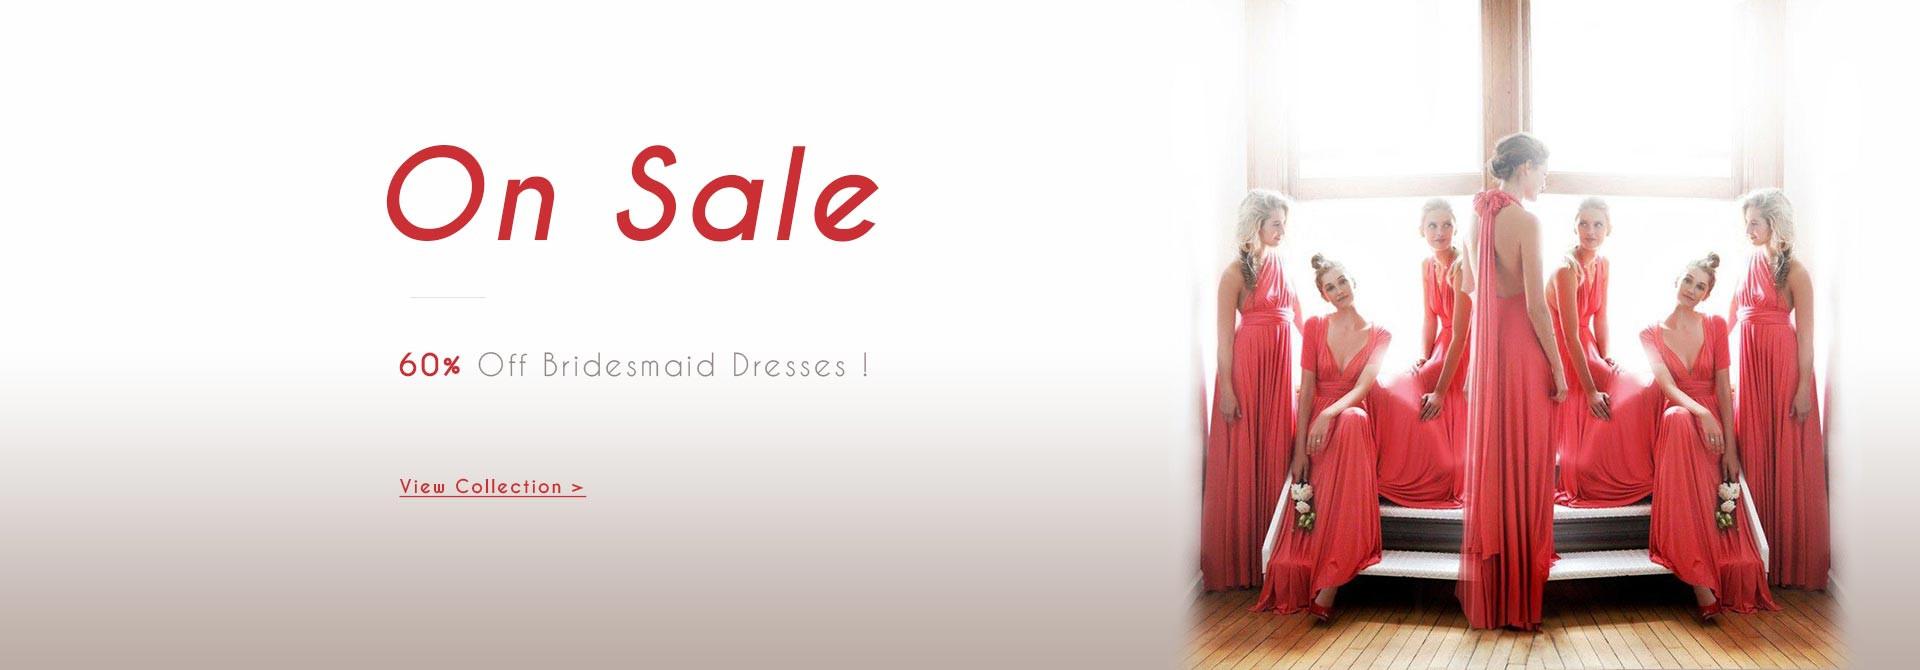 60% Off Bridesmaid Dresses